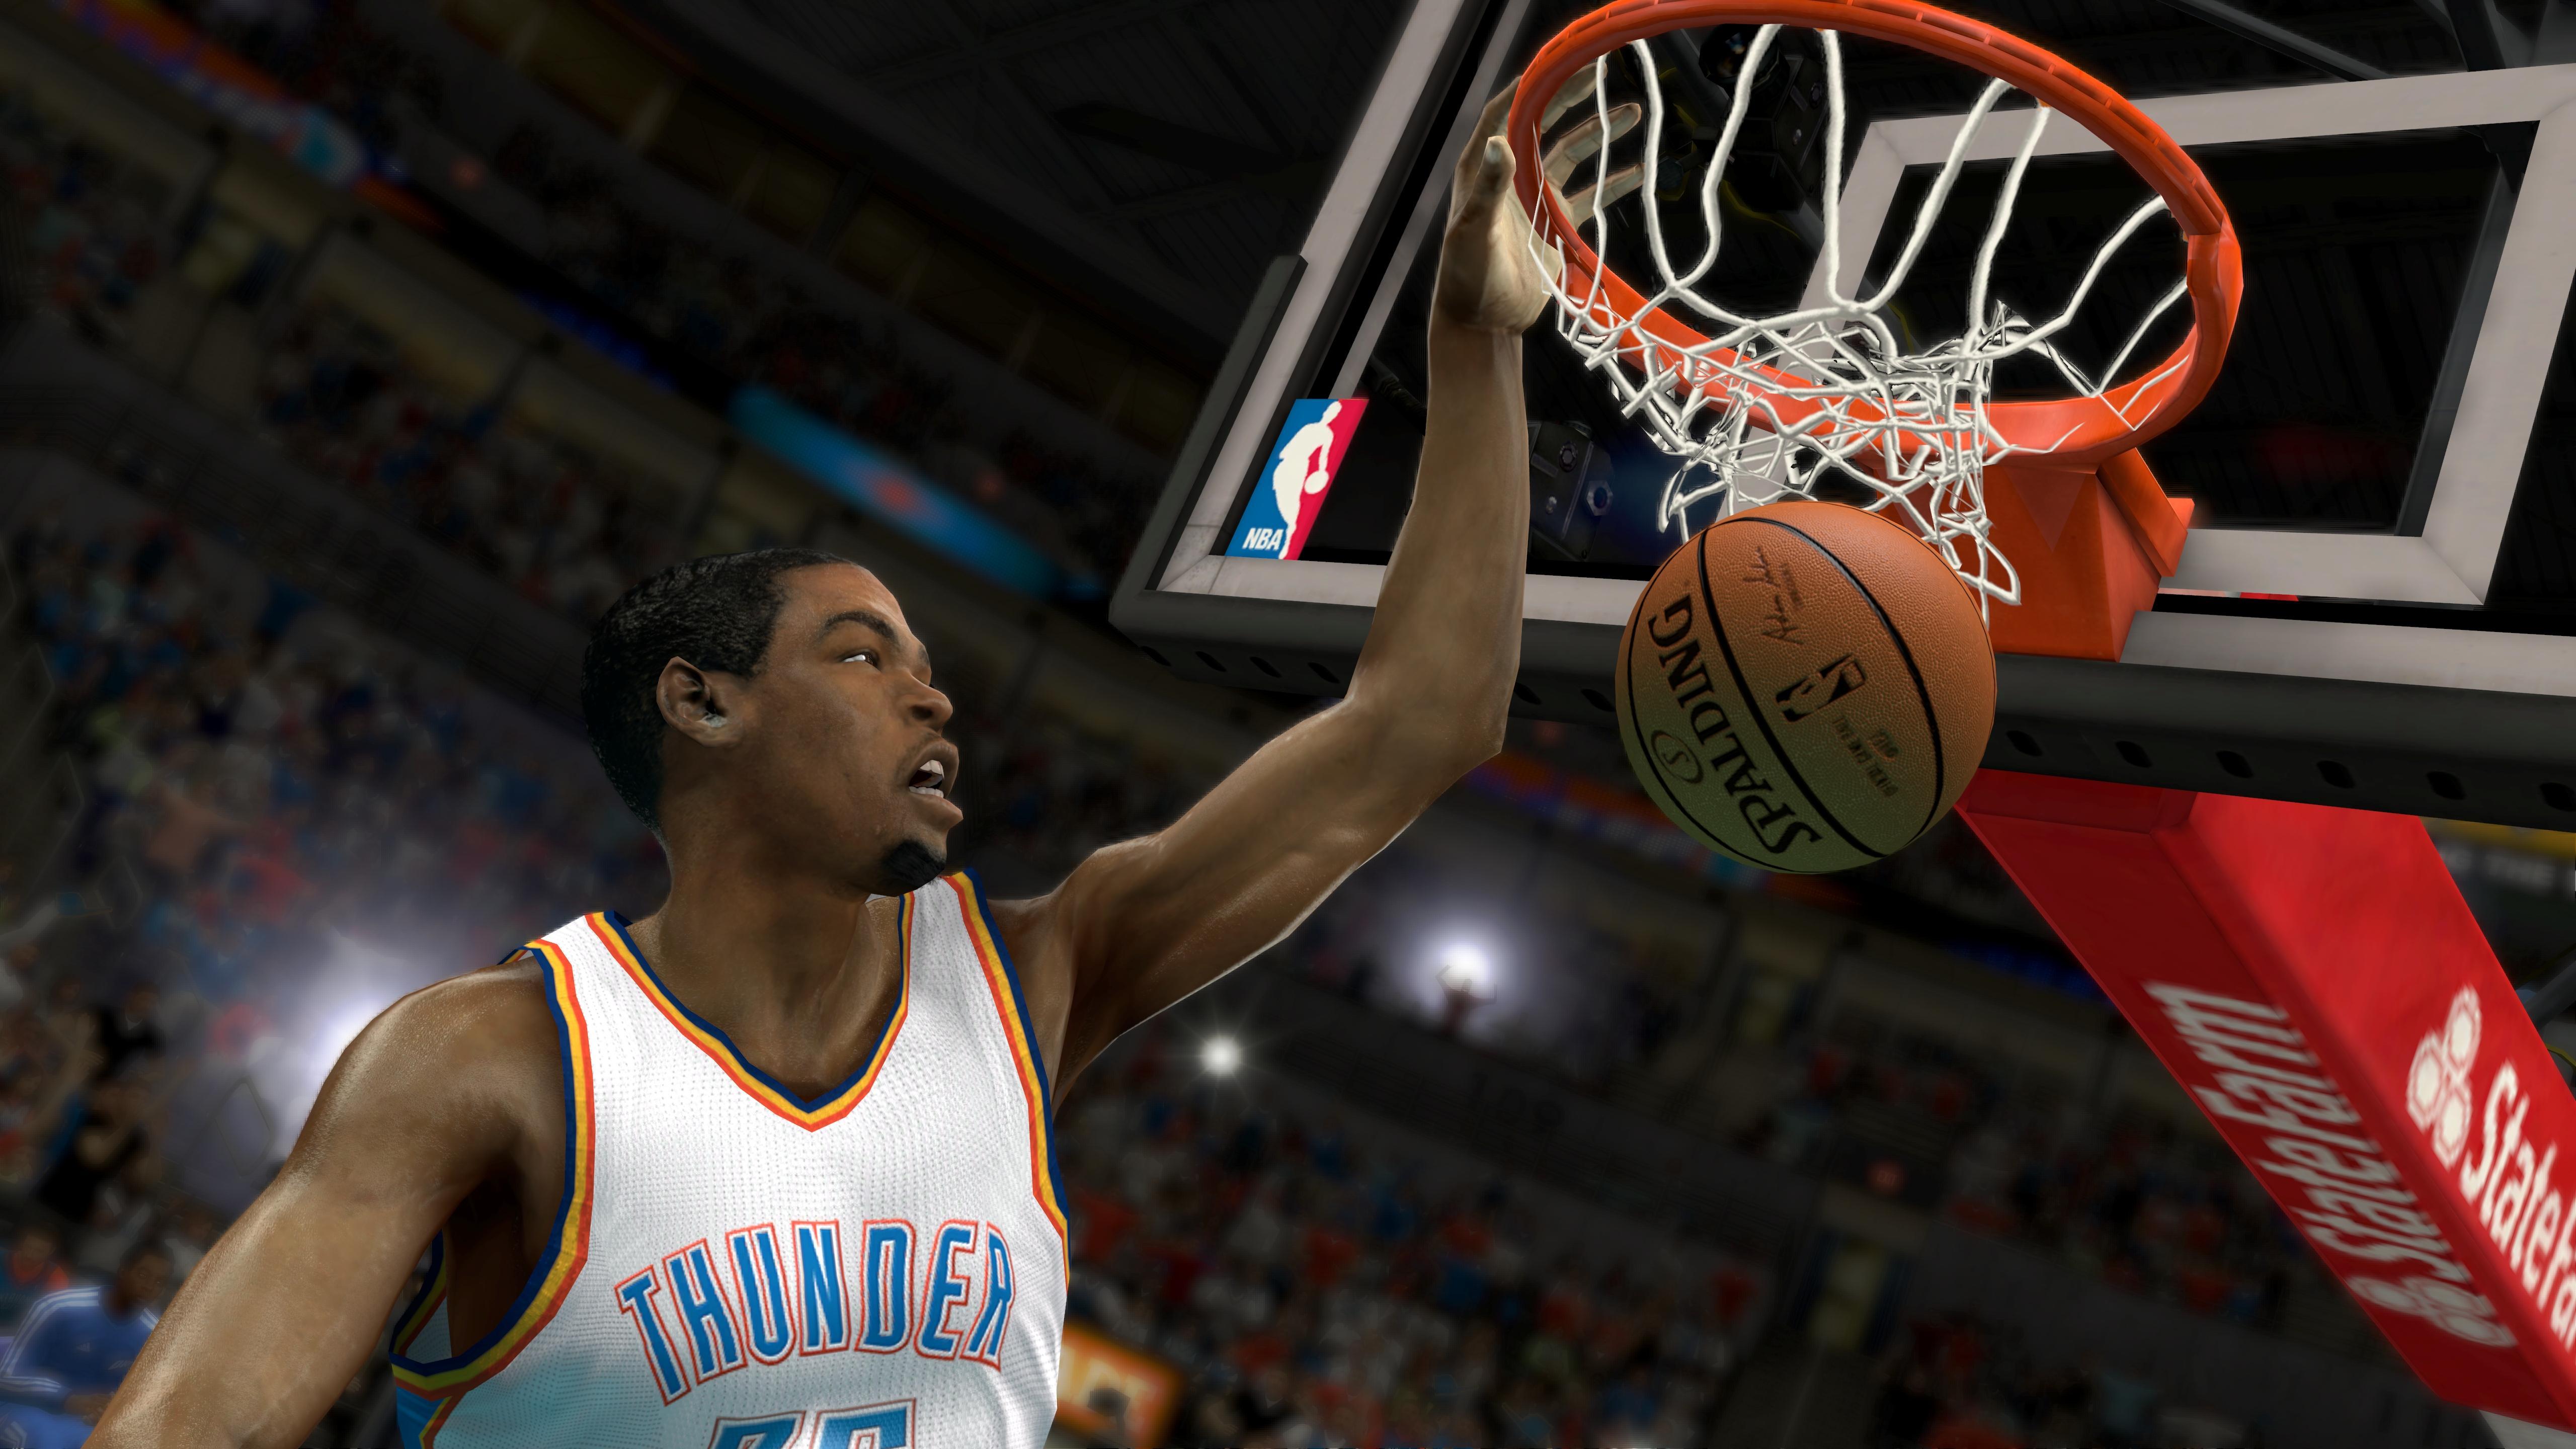 b926504fa839 Amazon.com  NBA 2K15 - PlayStation 3  Take 2 Interactive  Video Games